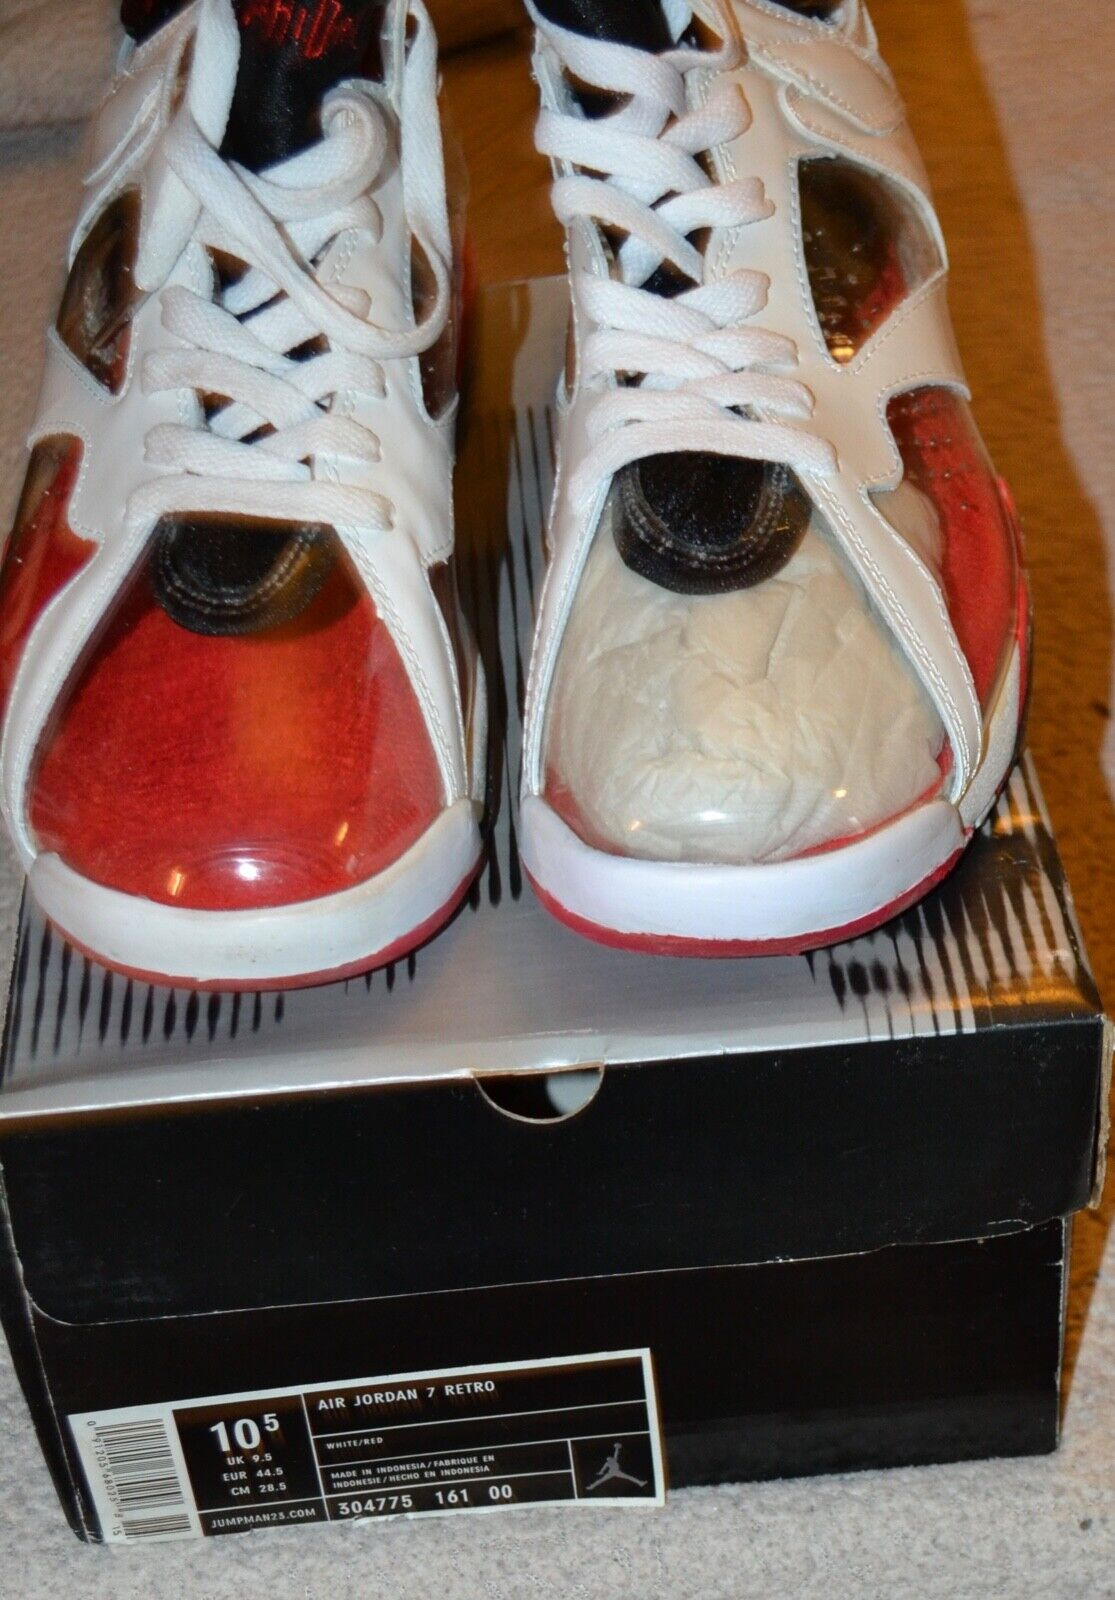 Nike air jordan 7 retro 304775-161 SZ. 10.5 Promo SHOE